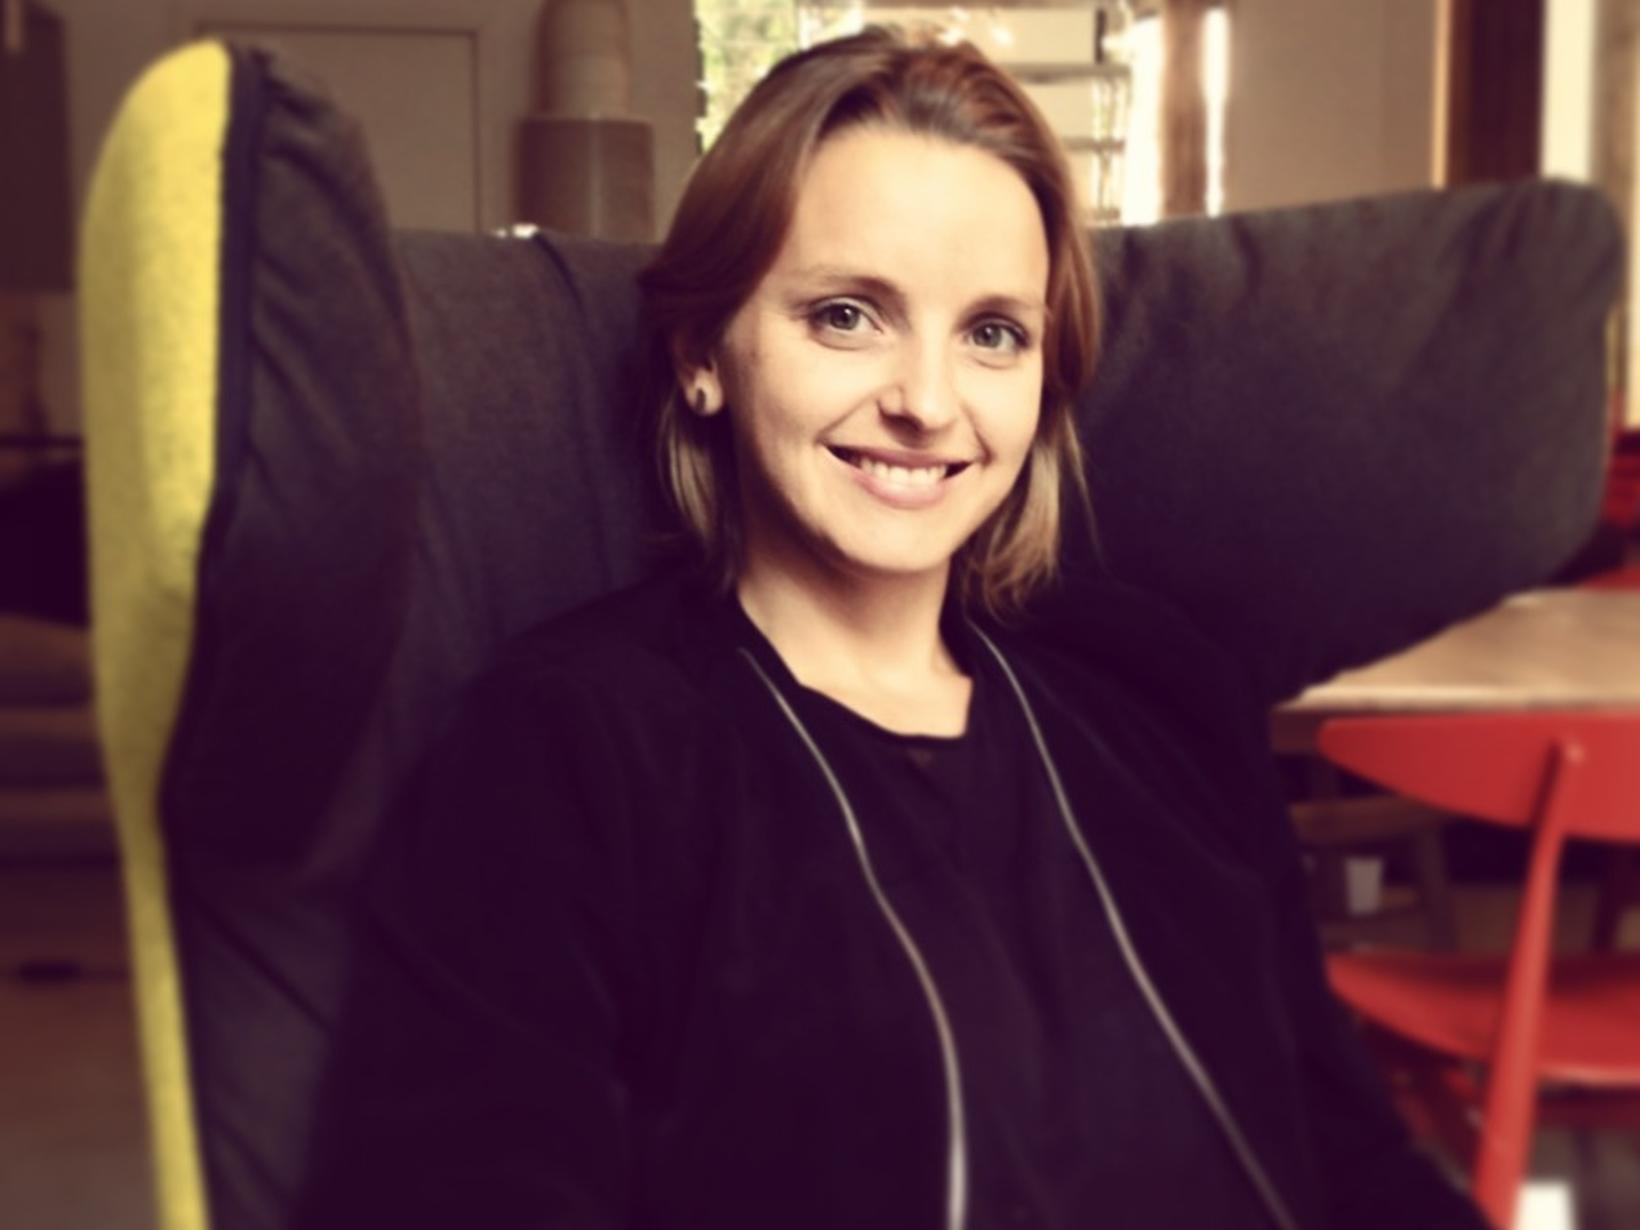 Astrid from Mechelen, Belgium